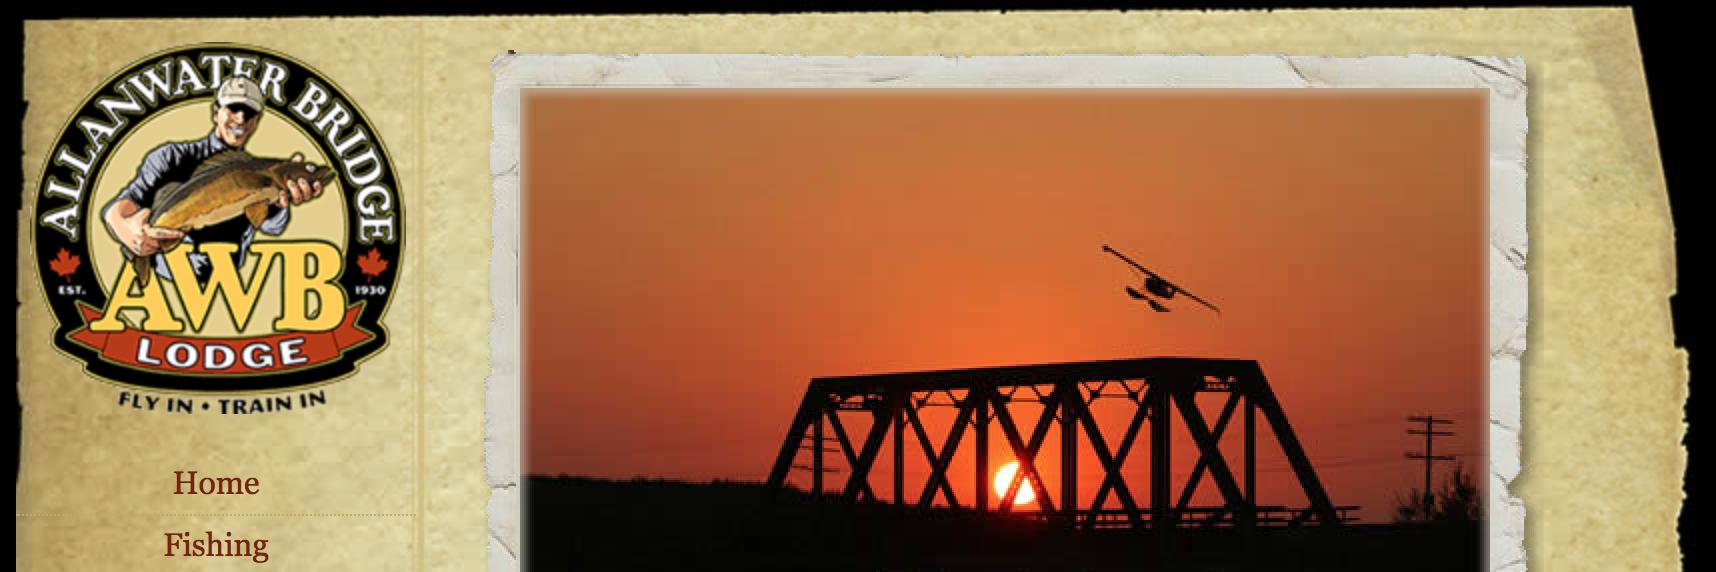 Allanwater Bridge Lodge header